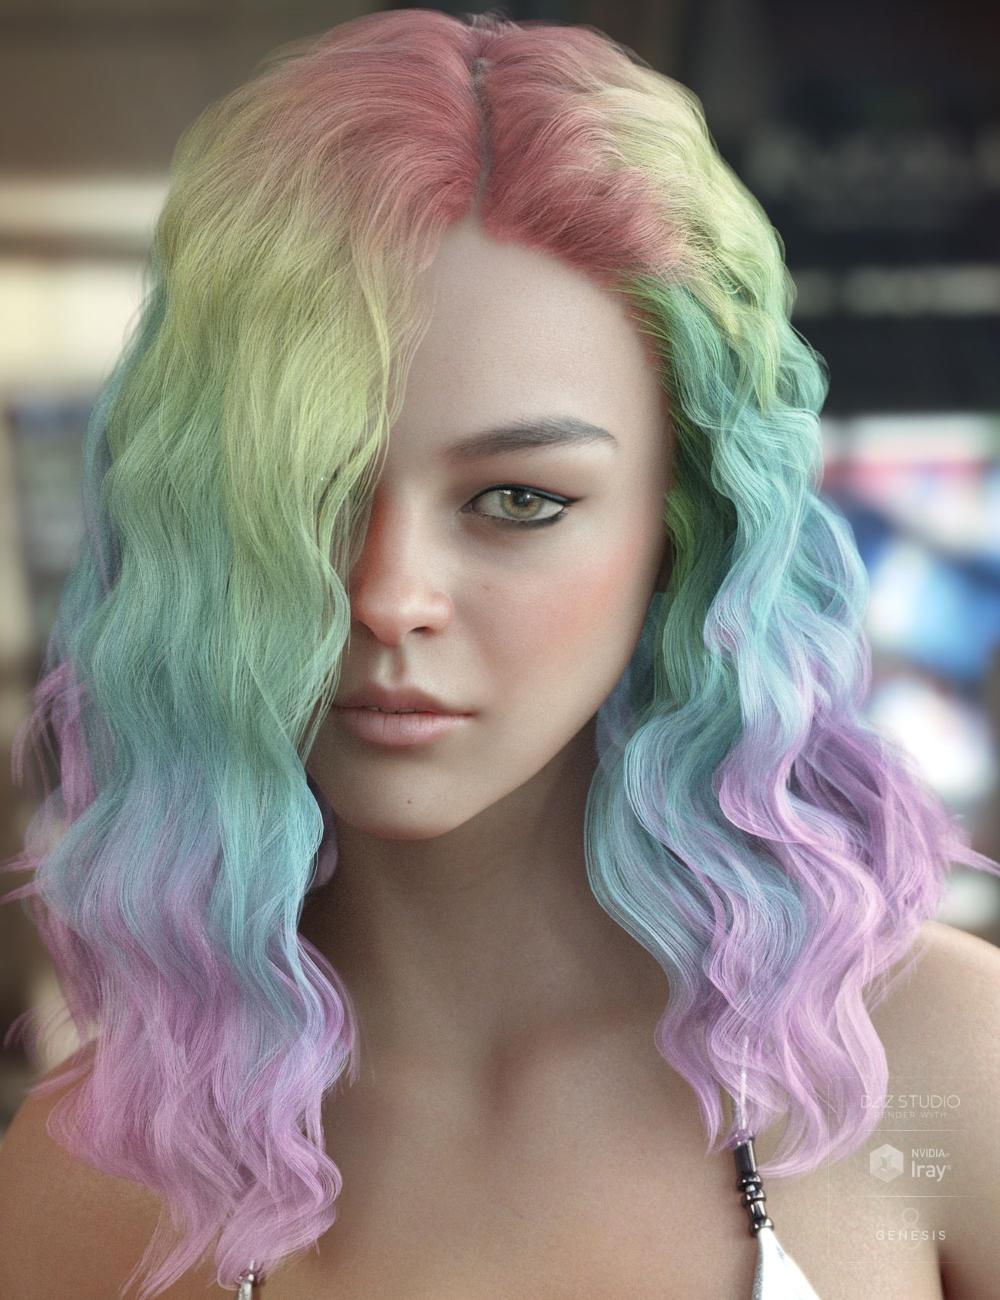 Vance Hair Bundle for Genesis 3 & 8 by: AprilYSH, 3D Models by Daz 3D